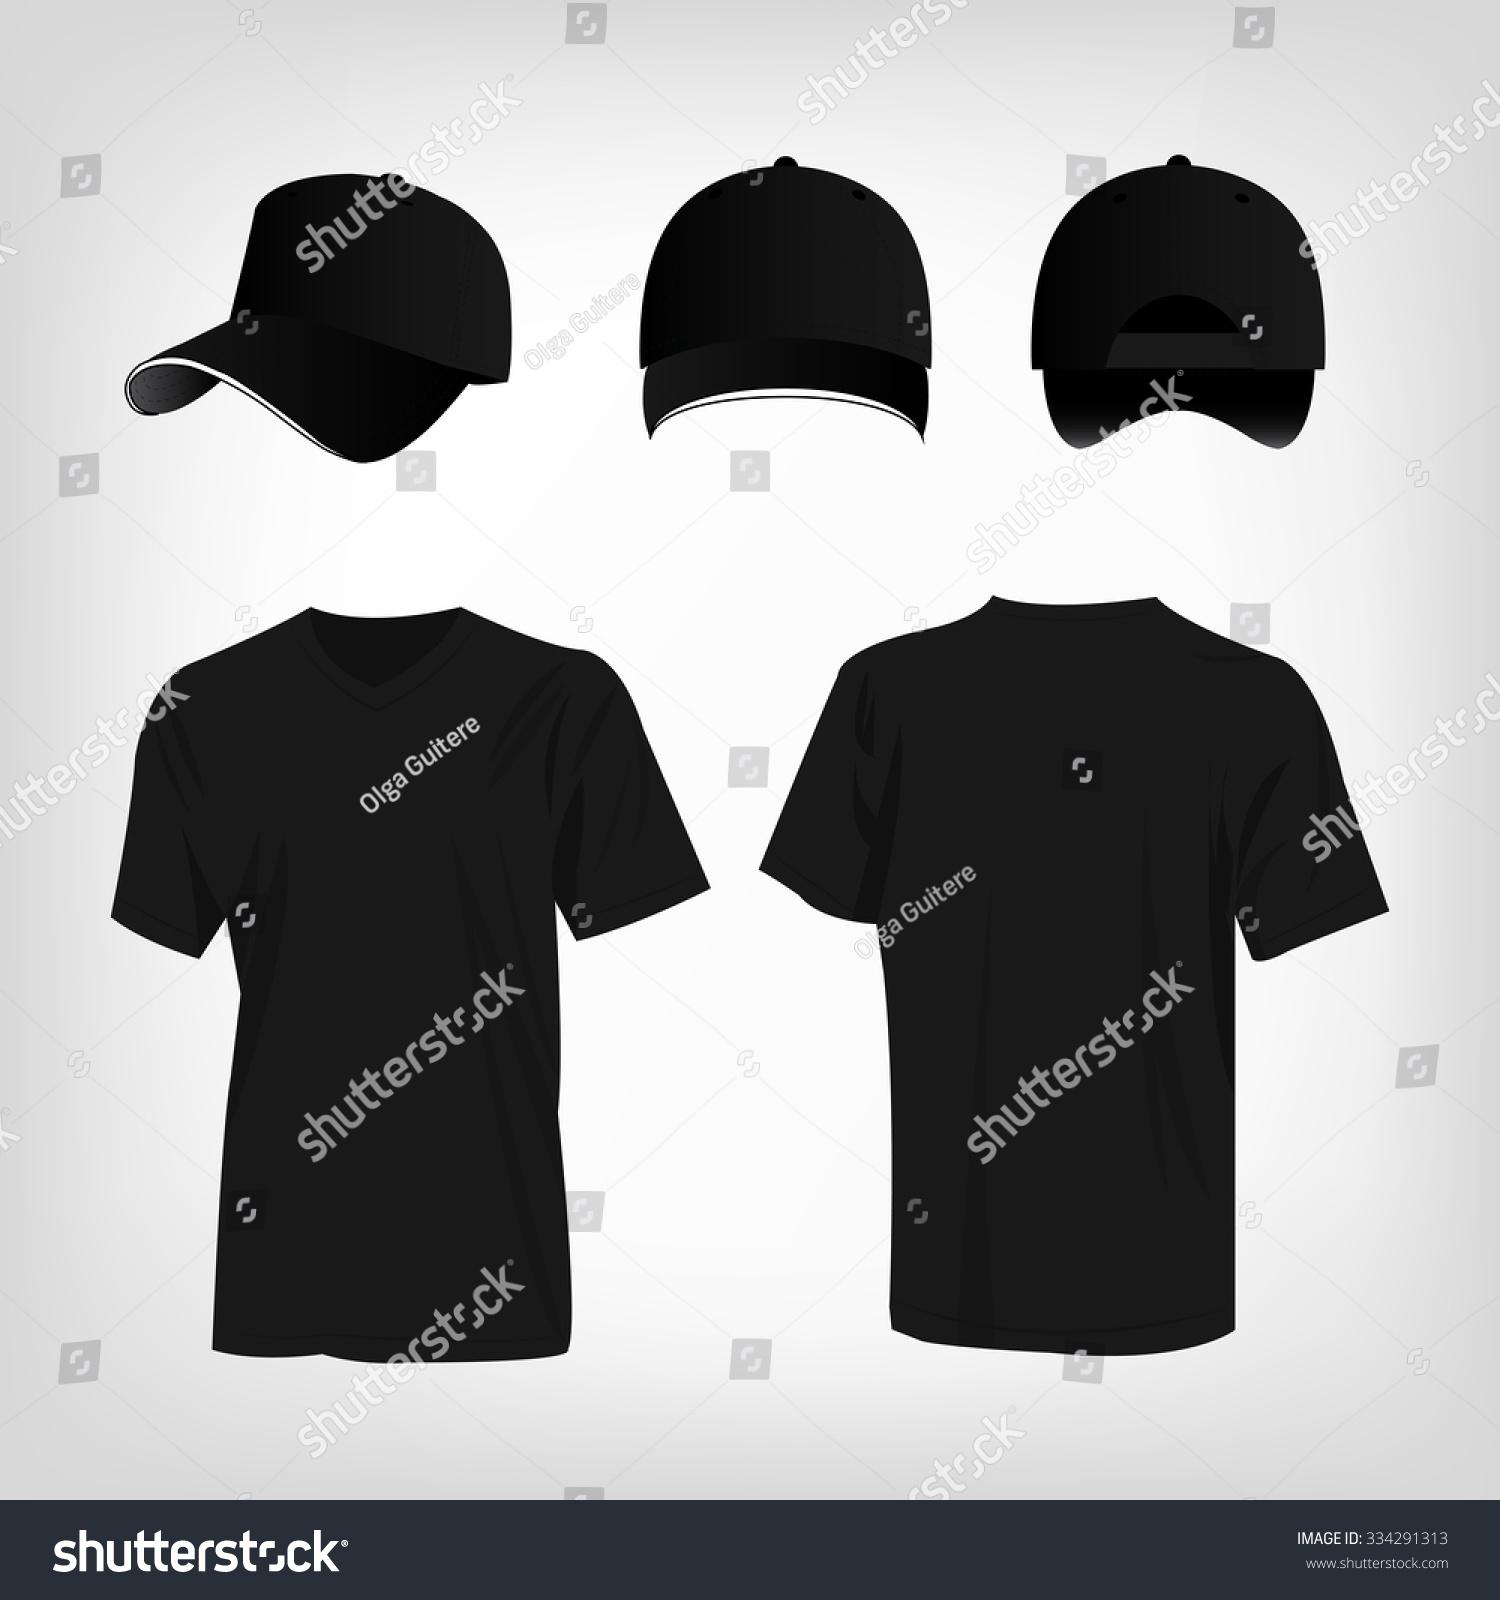 Black t shirt vector - Sportswear Black T Shirt And Black Baseball Cap Vector Set